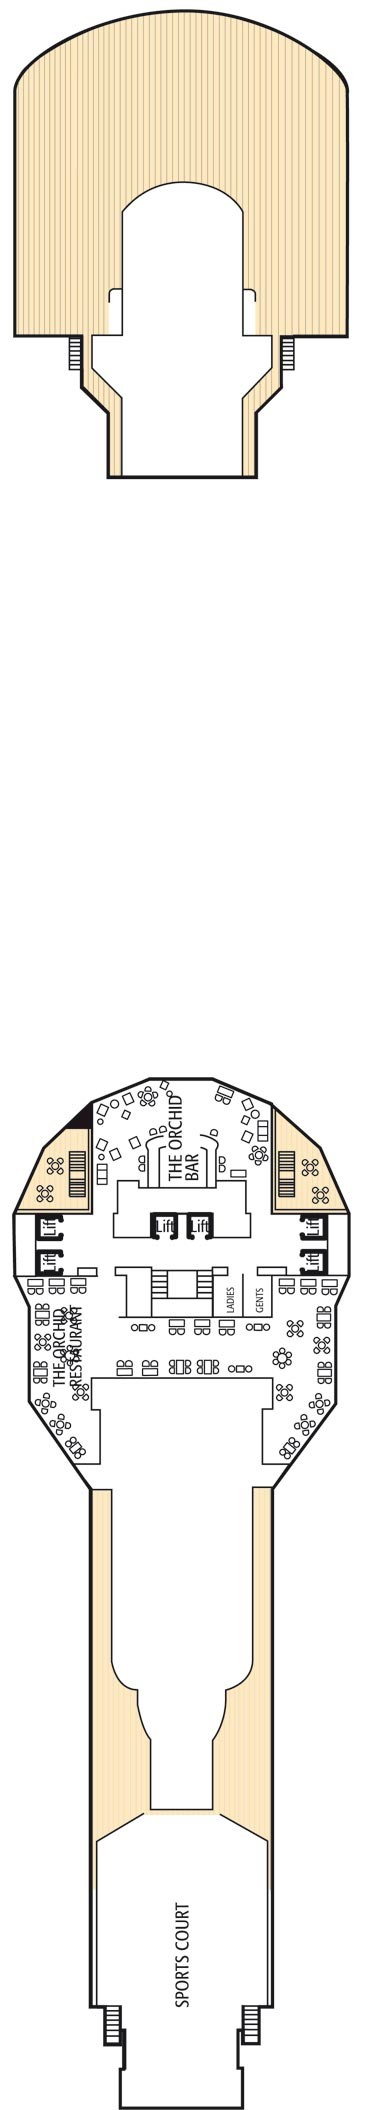 Sky deck deck plan for Arcadia deck plans